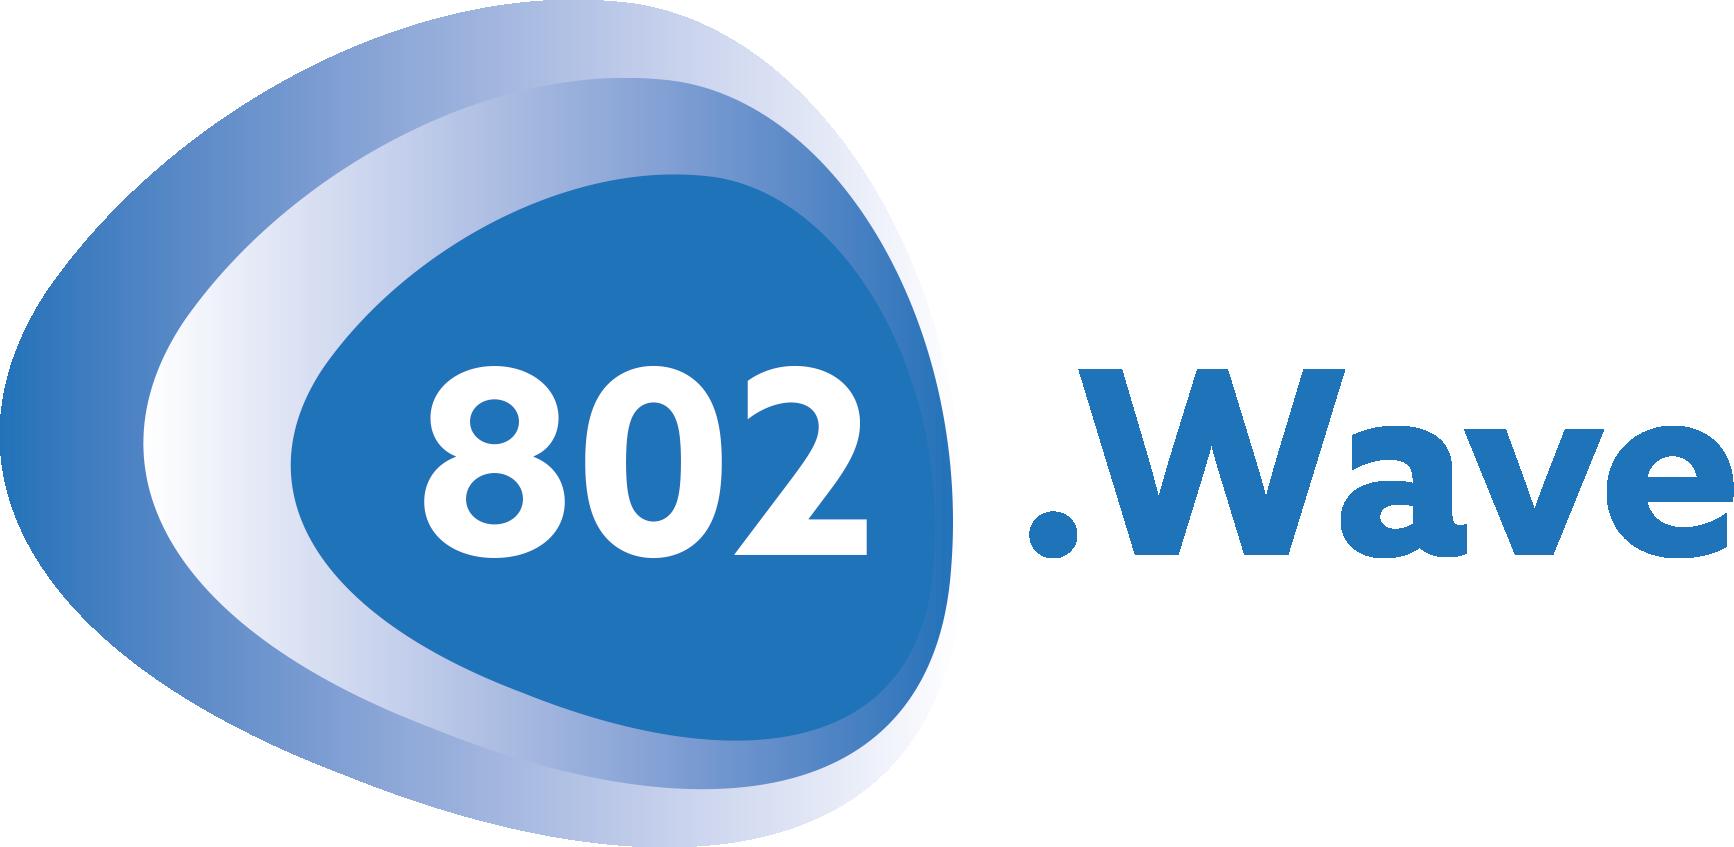 802 Service